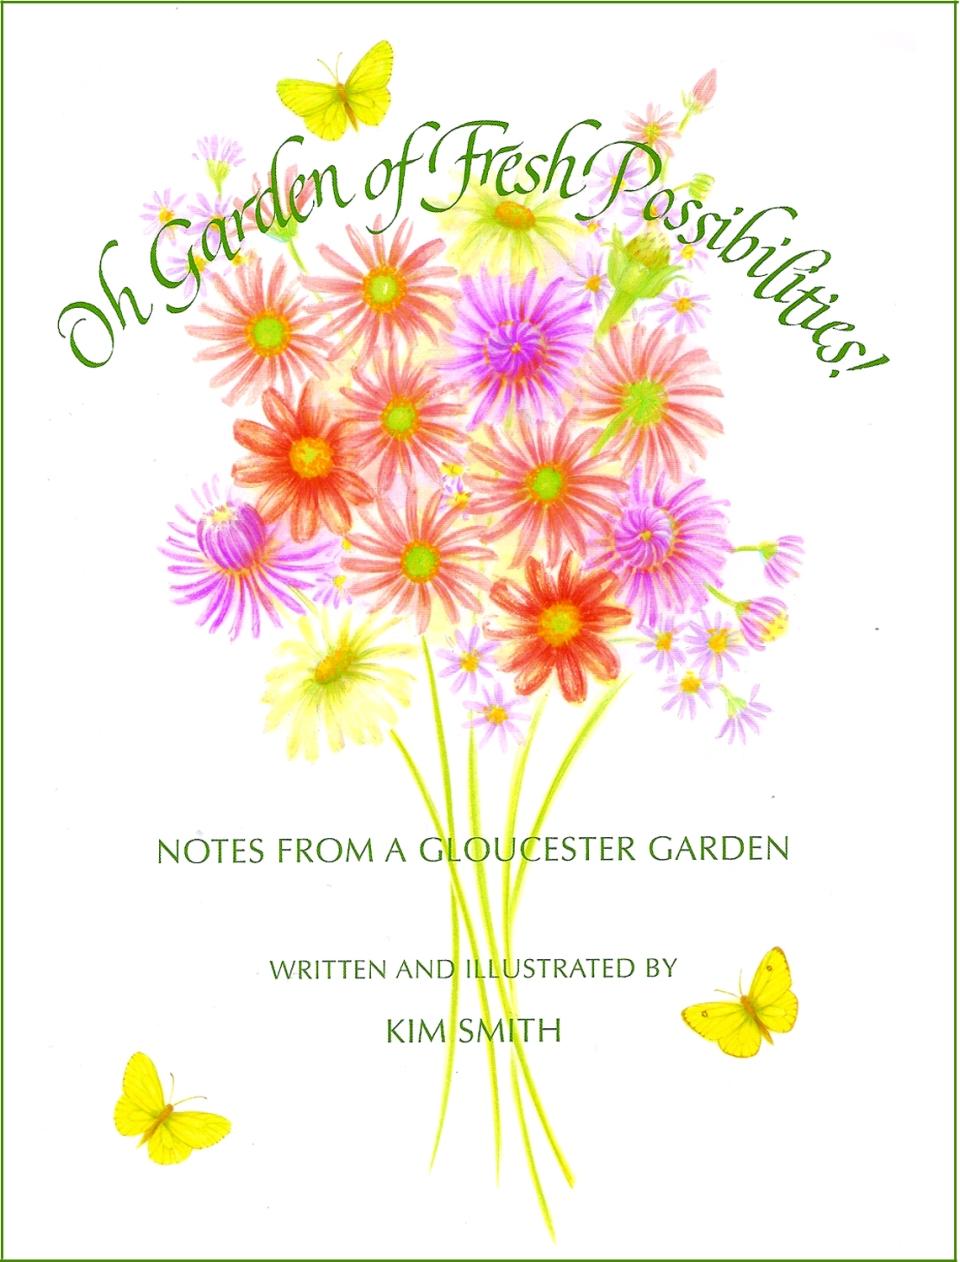 Oh Garden of Fresh Possibilities! Kim Smith